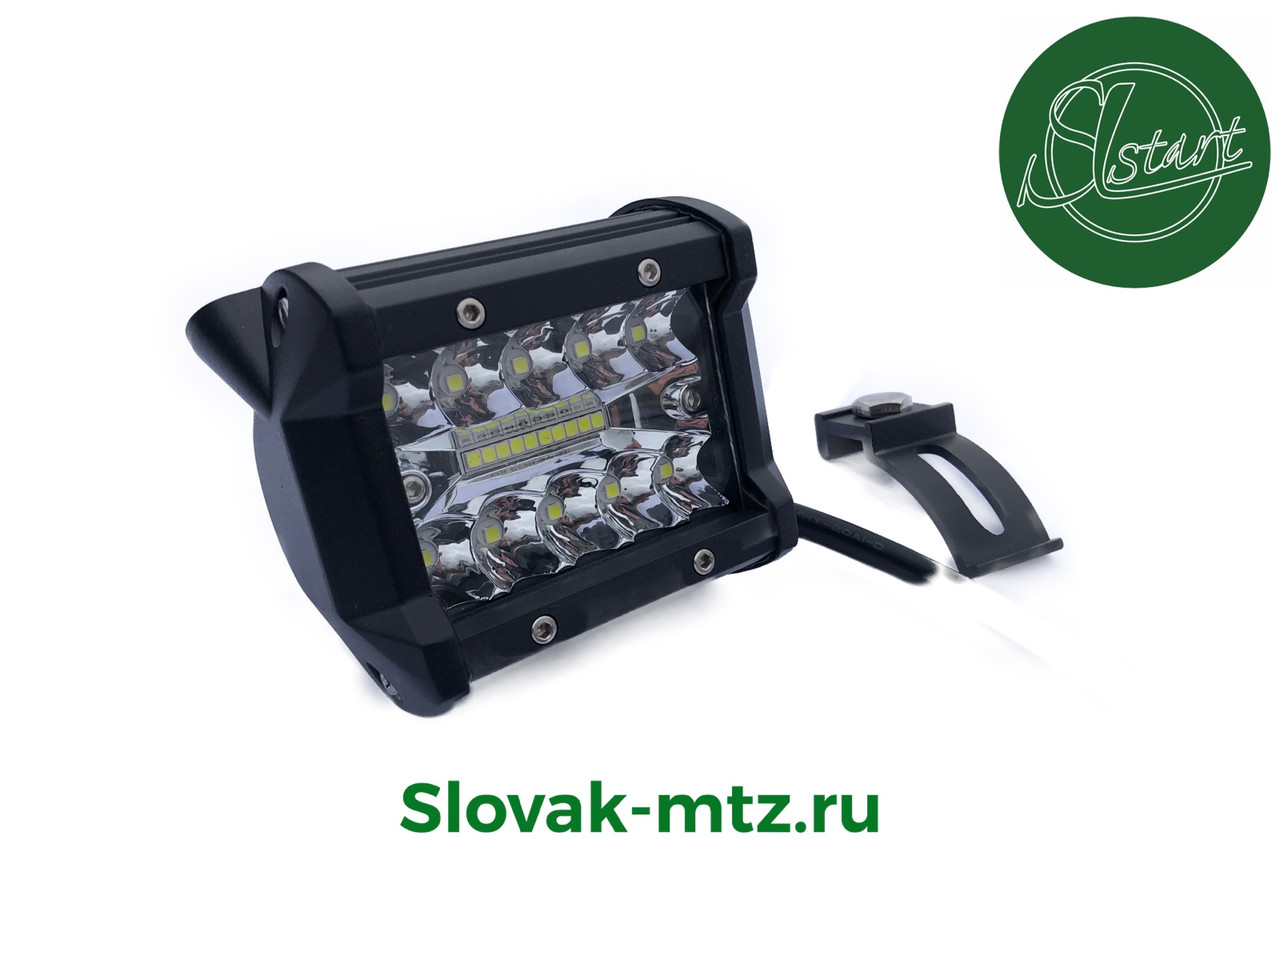 Светодиодная LED фара 60Вт (светодиоды 3w x20шт)